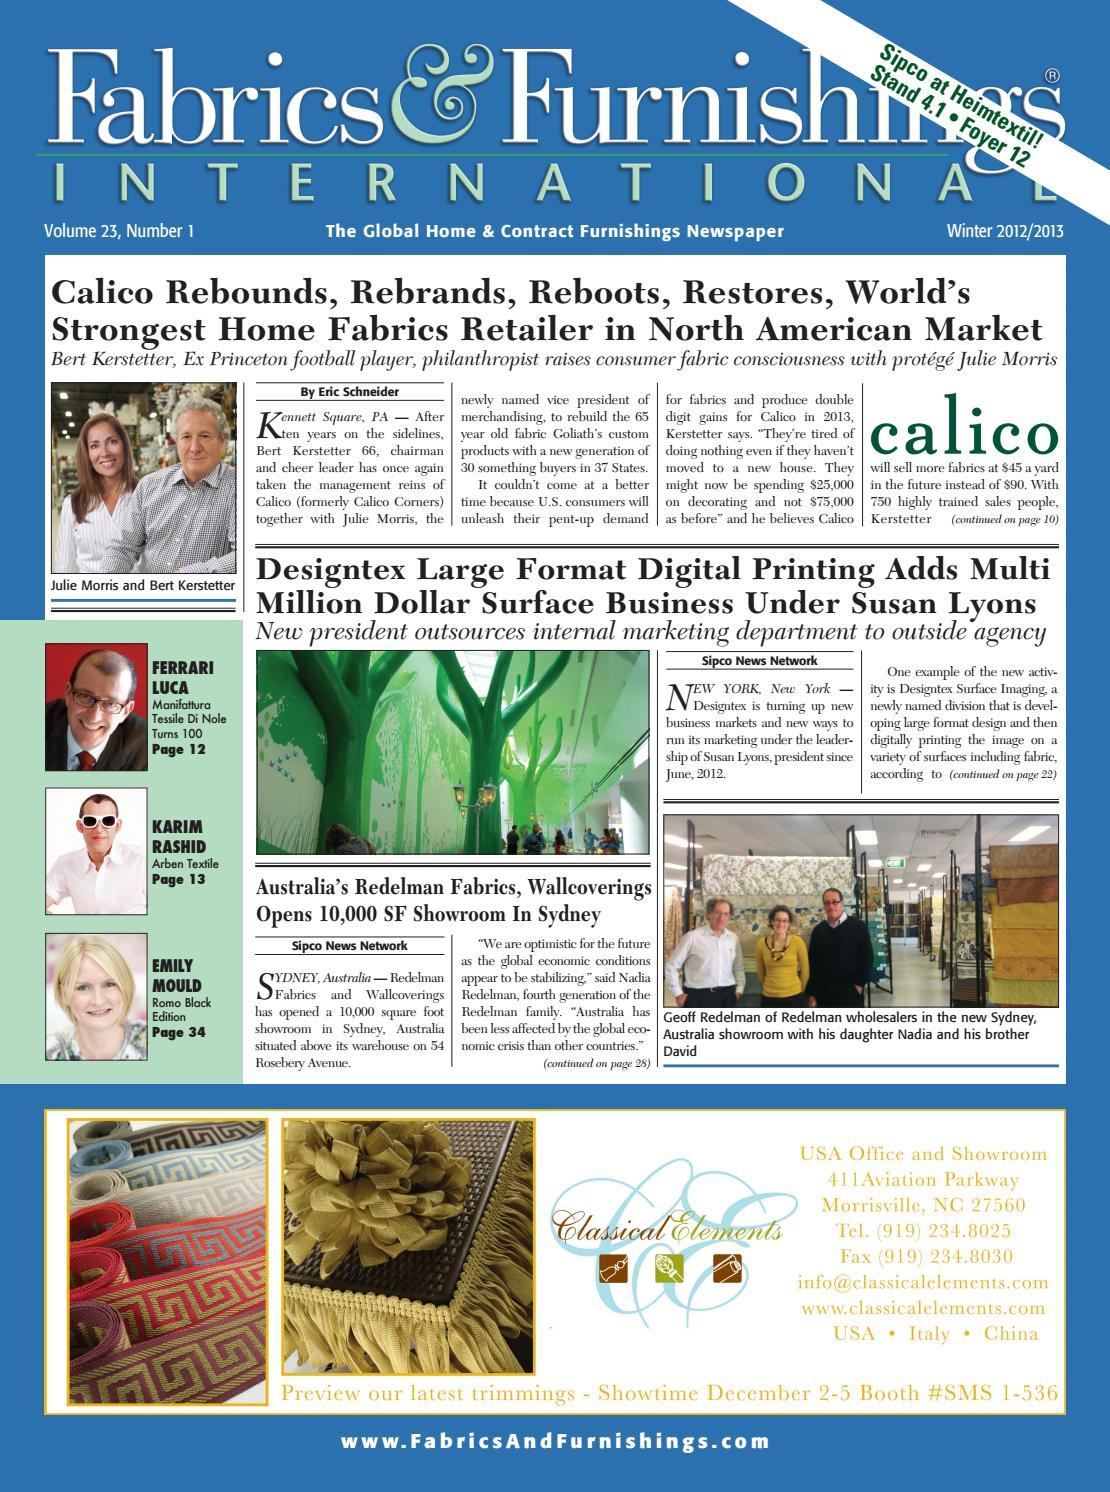 Fabrics & Furnishings - Winter 2012 Issue by Fabrics & Furnishings